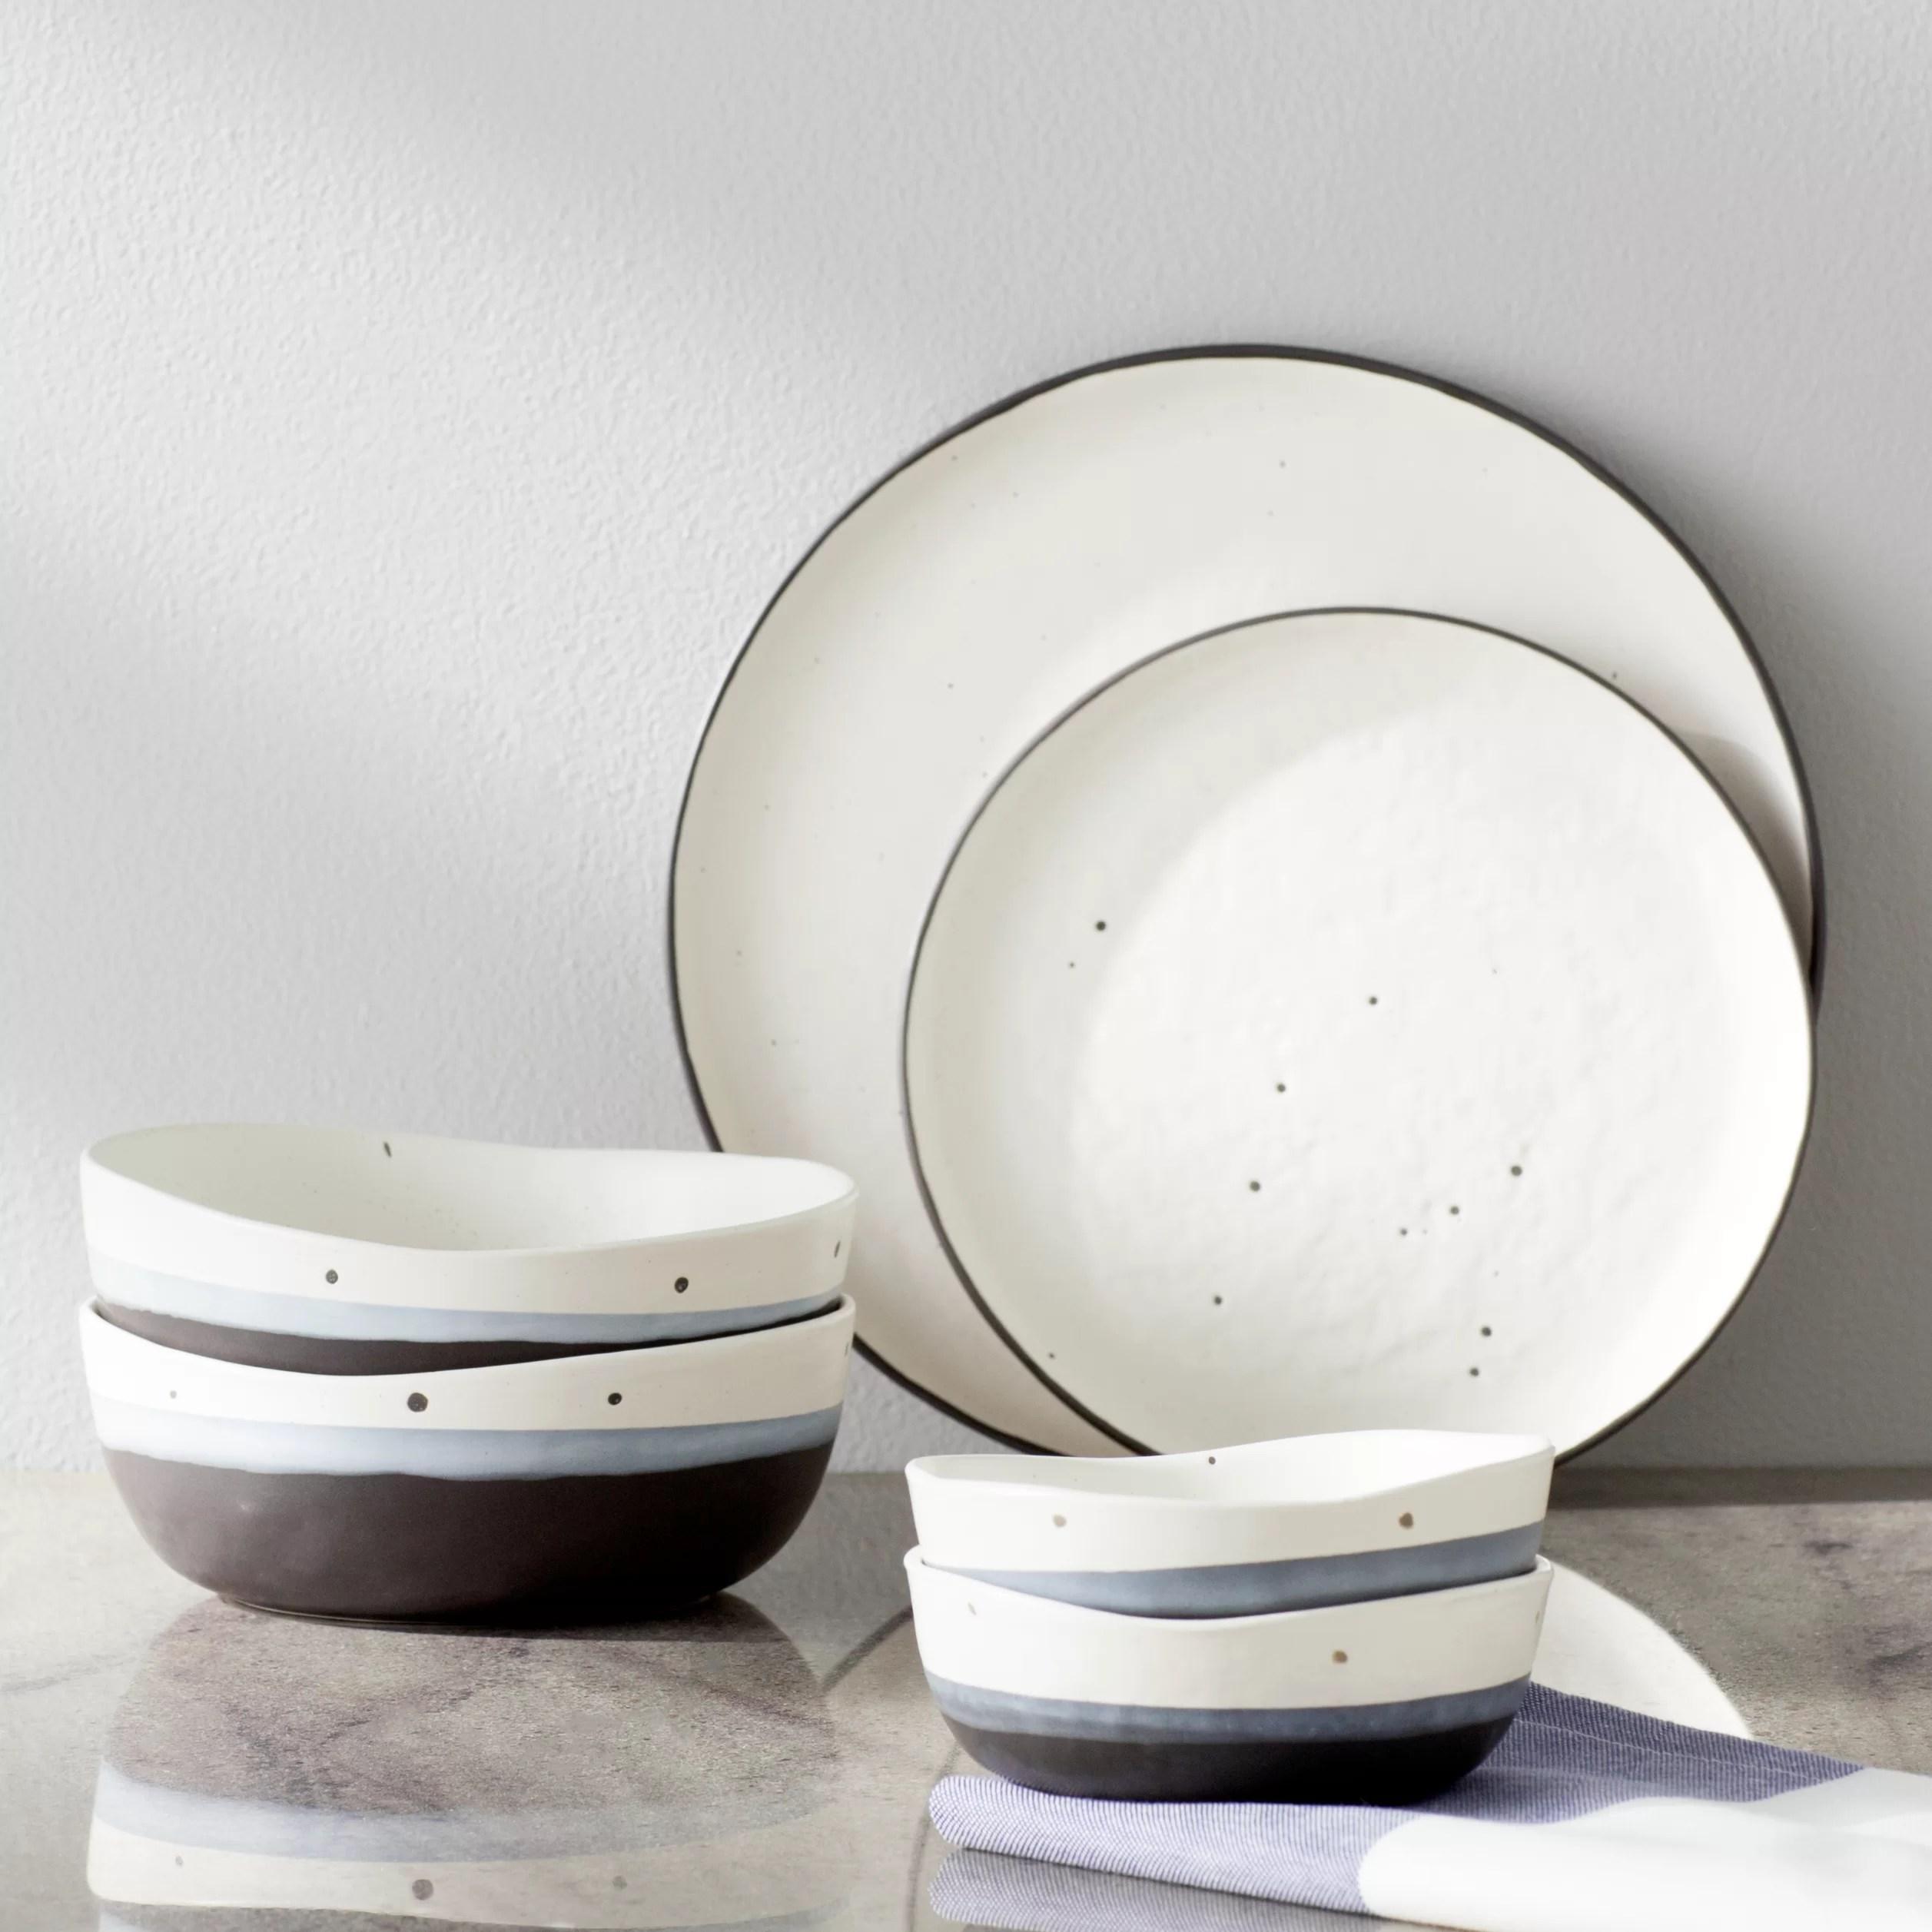 Mint Pantry Thistle 16 Piece Double Bowl Dinnerware Set